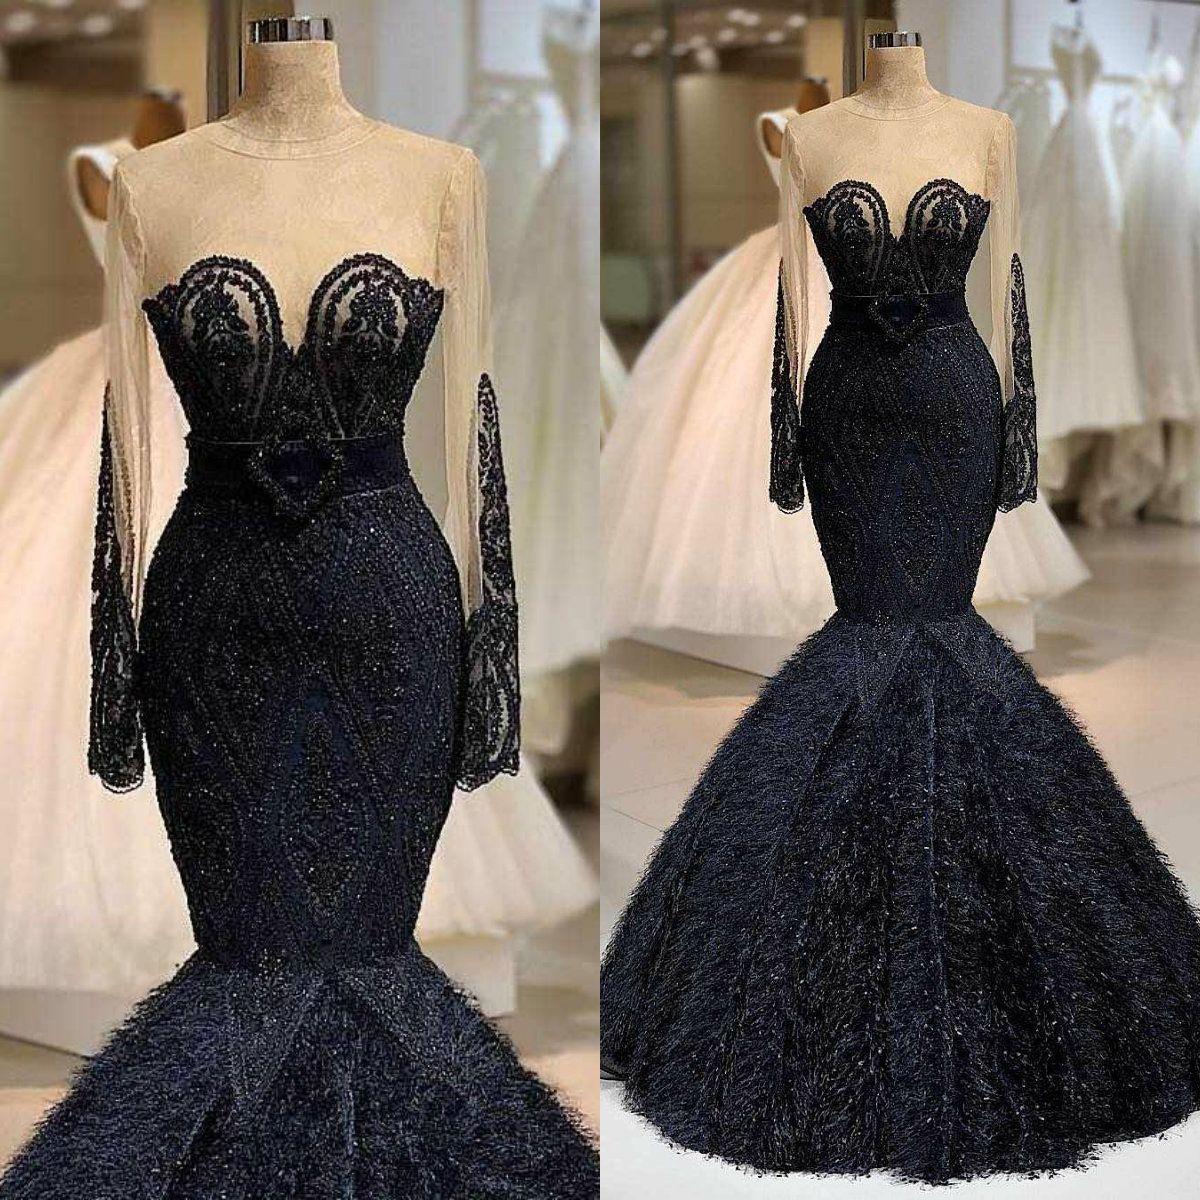 2020 Luxury Mermaid Arabic Evening Dresses Jewel Neck Beaded Feather Floor Length Long Sleeve Prom Dress Formal Party Wear